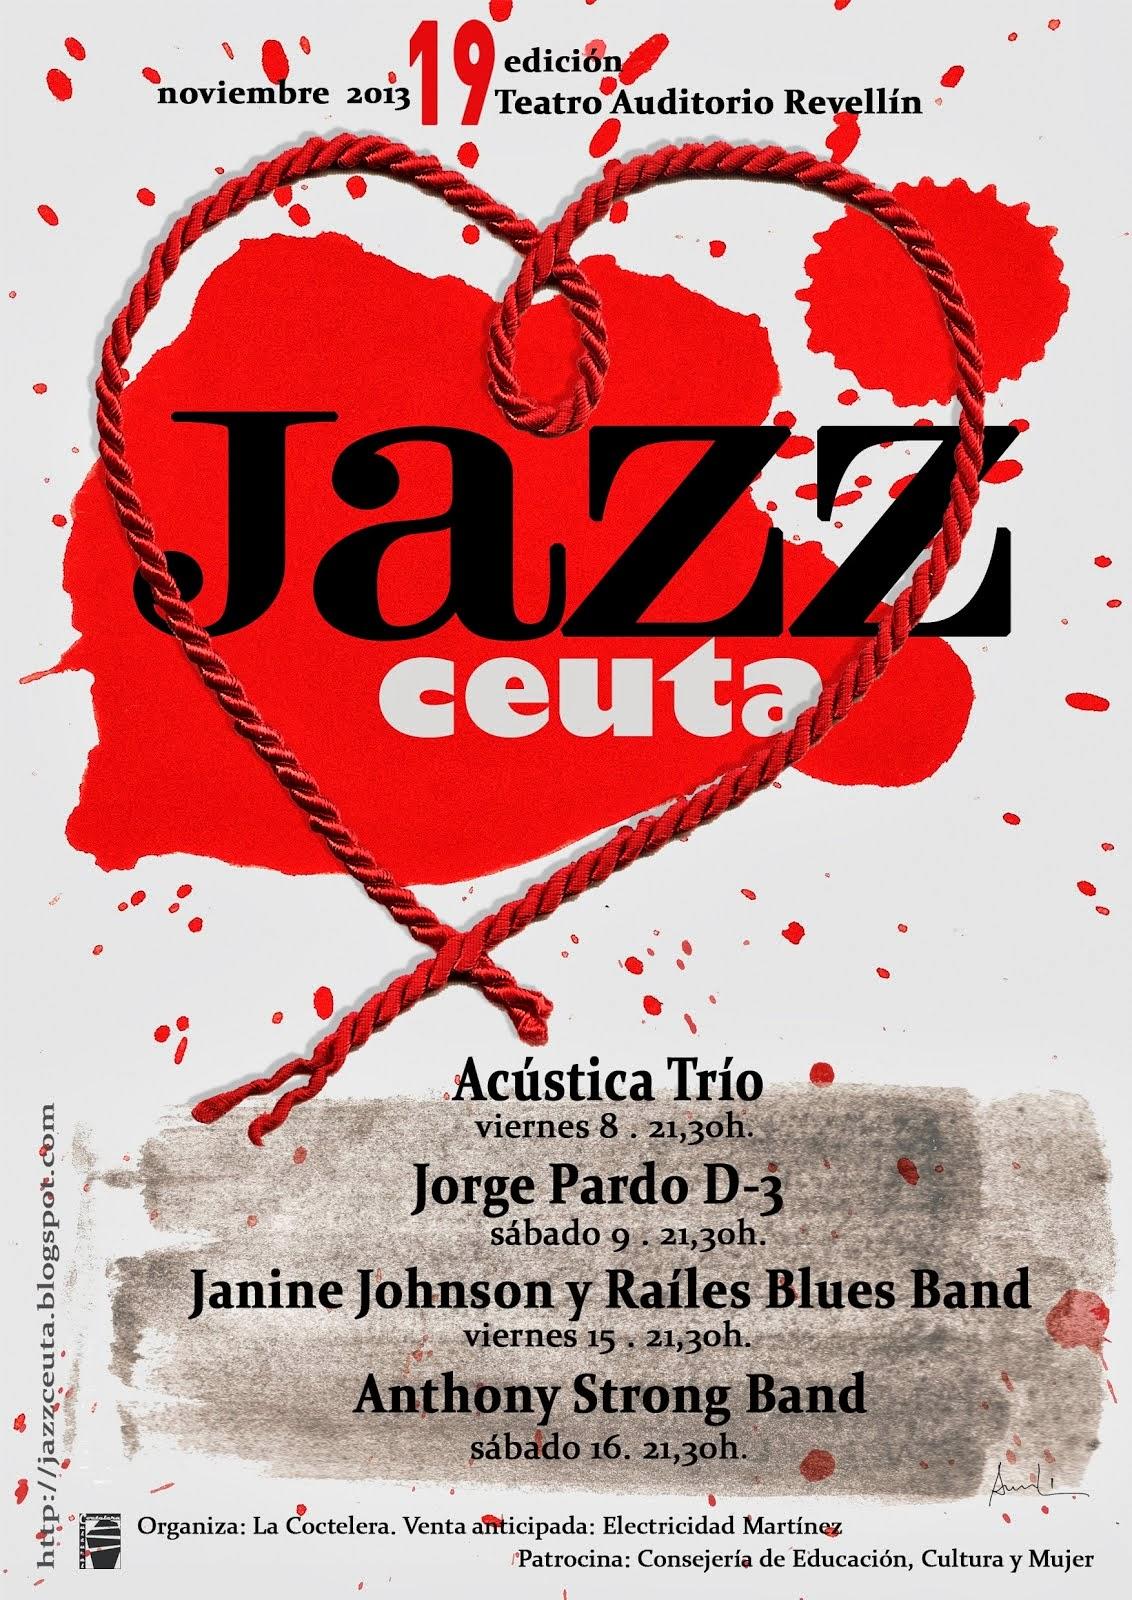 XIX festival de jazz de Ceuta